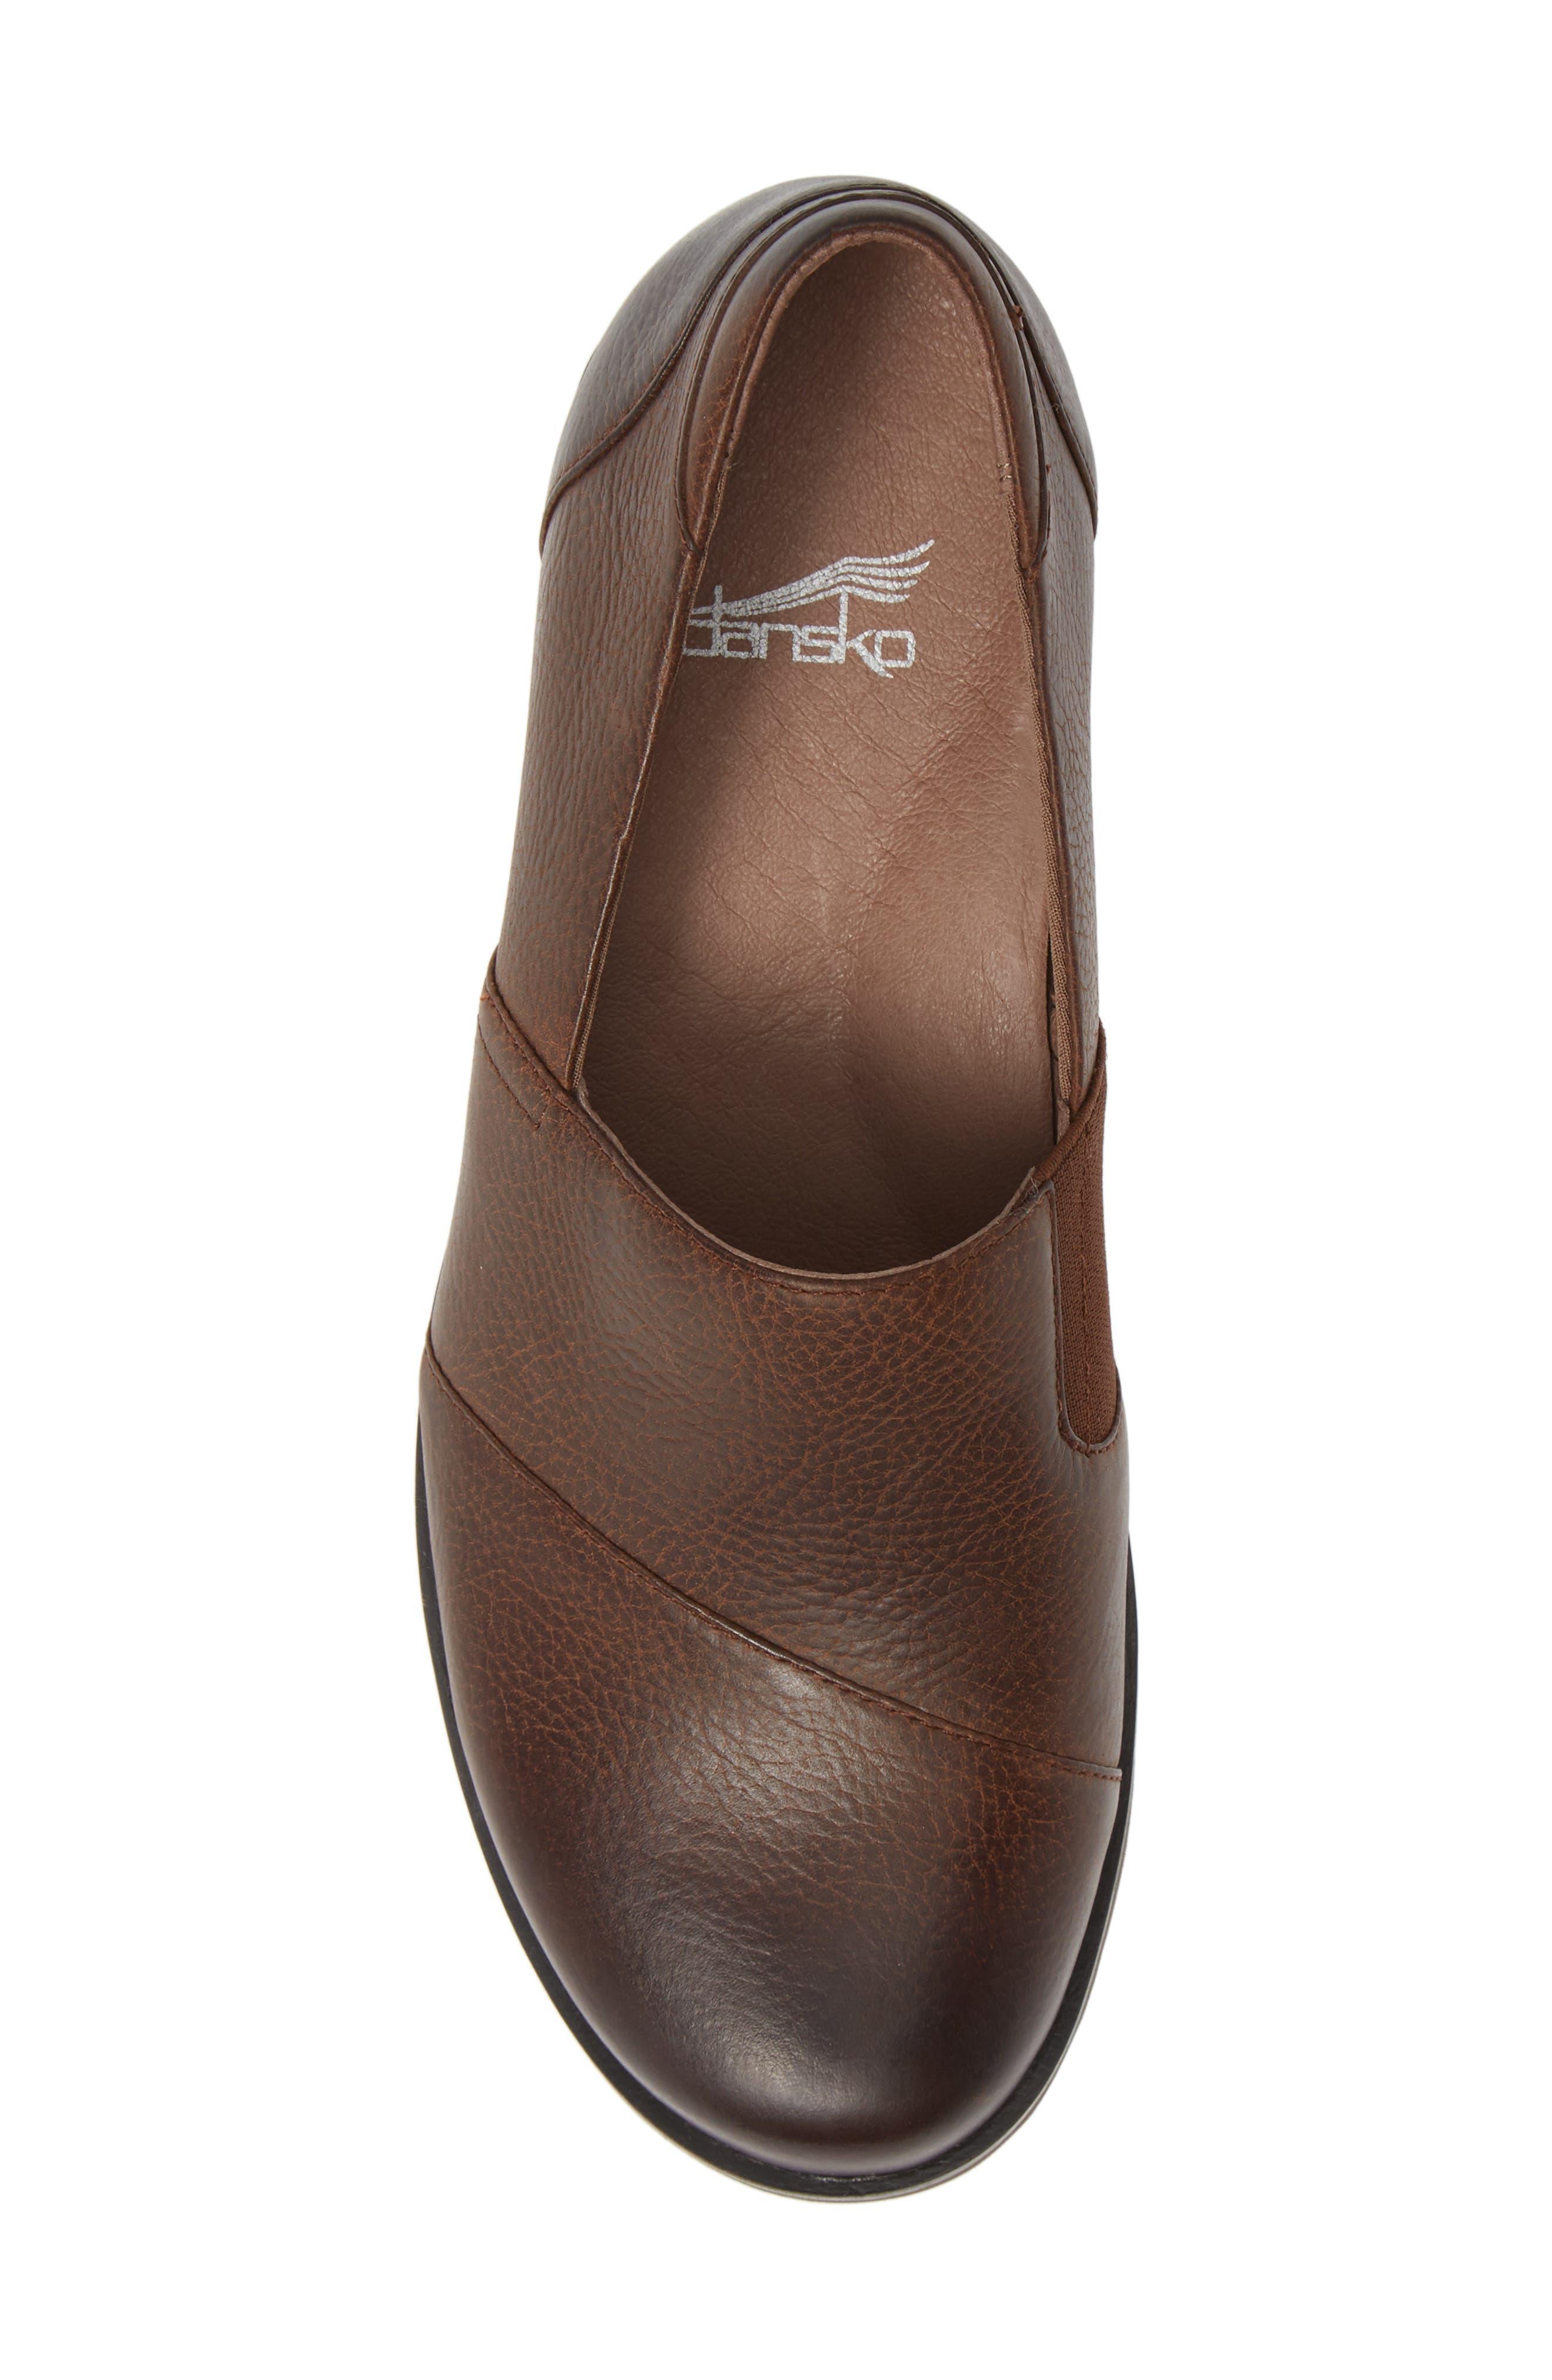 Dankso Julia Wedge Slip-On,                             Alternate thumbnail 6, color,                             Brown Burnished Nubuck Leather